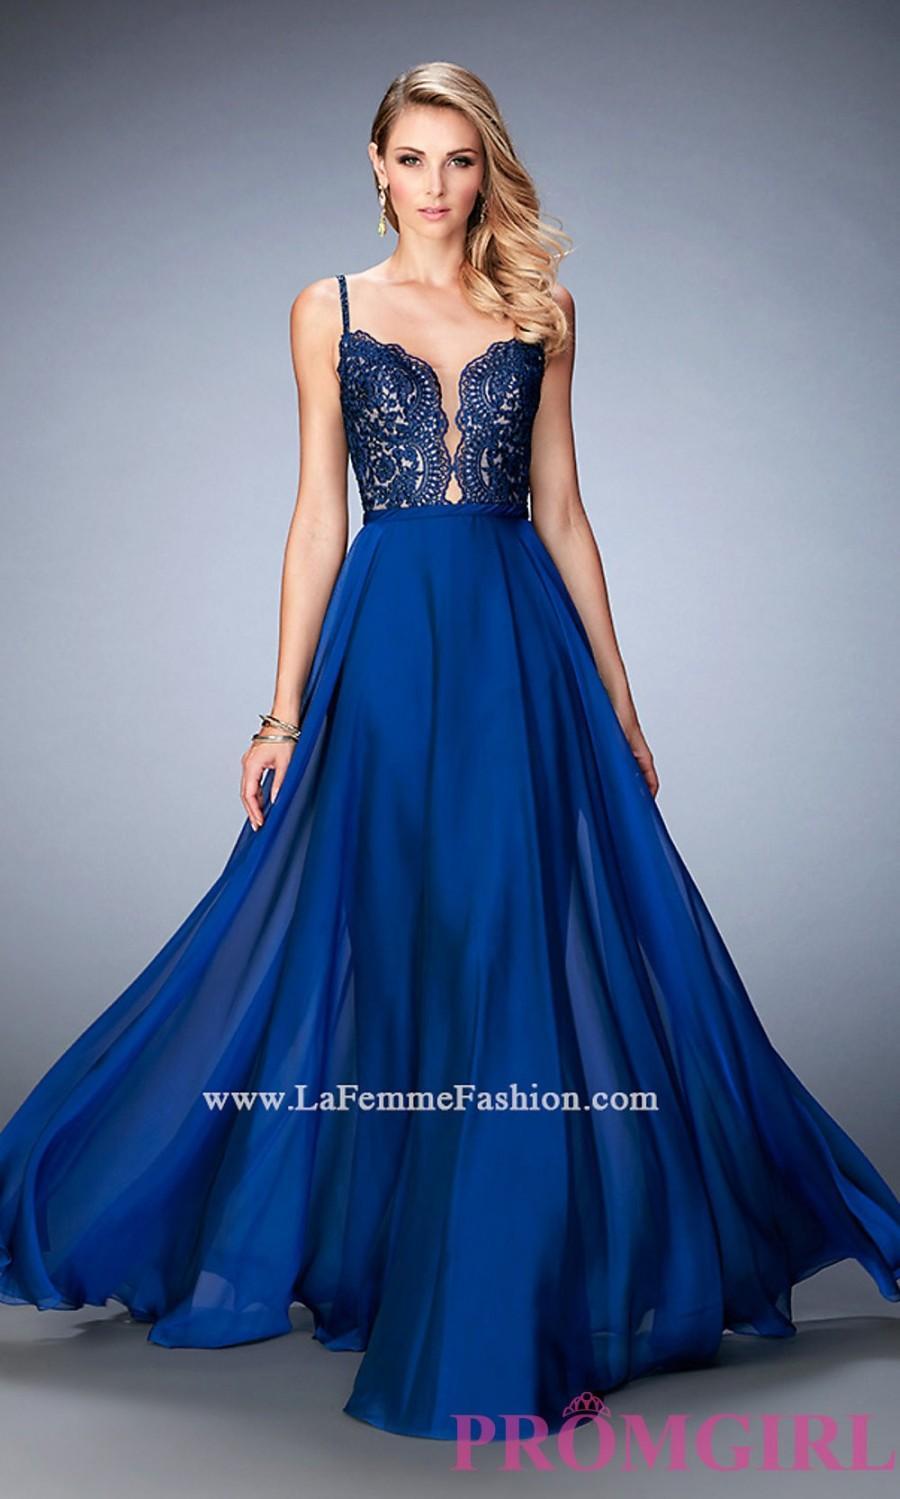 Long Sweetheart La Femme Prom Dress With An Open Back - Discount ...